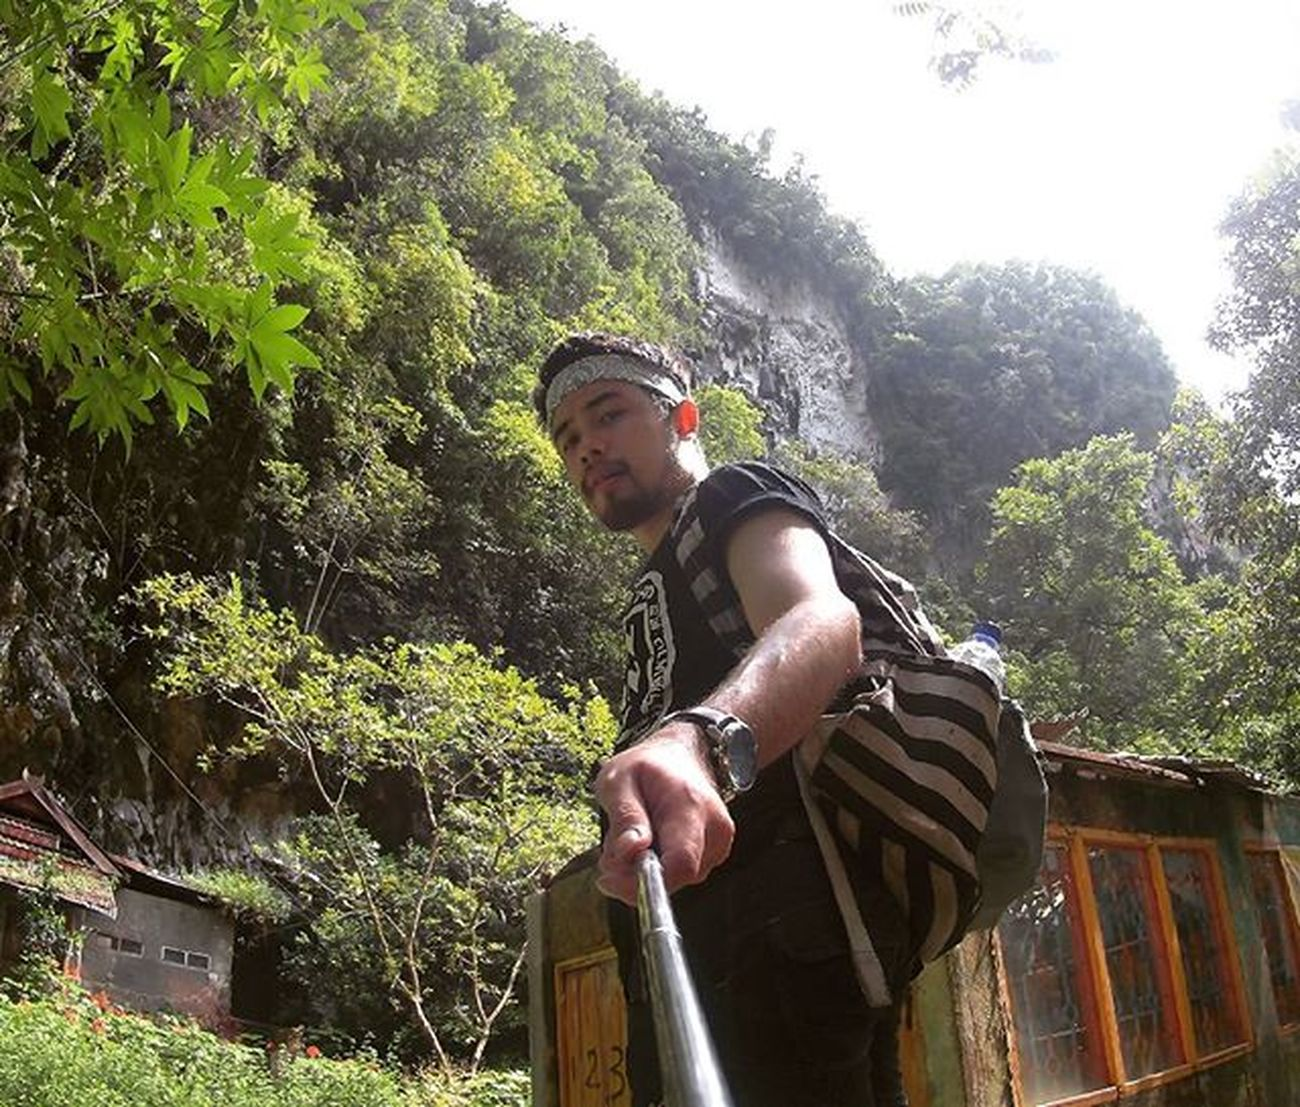 Traveling INDONESIA Couchsurfing Trip Adventure Paradaise Roadtrip Jalan2man Jalanjalan Visitindonesia Explore Waterfall Cave Makassar Maros  Sulawesi Freedome  Play Main